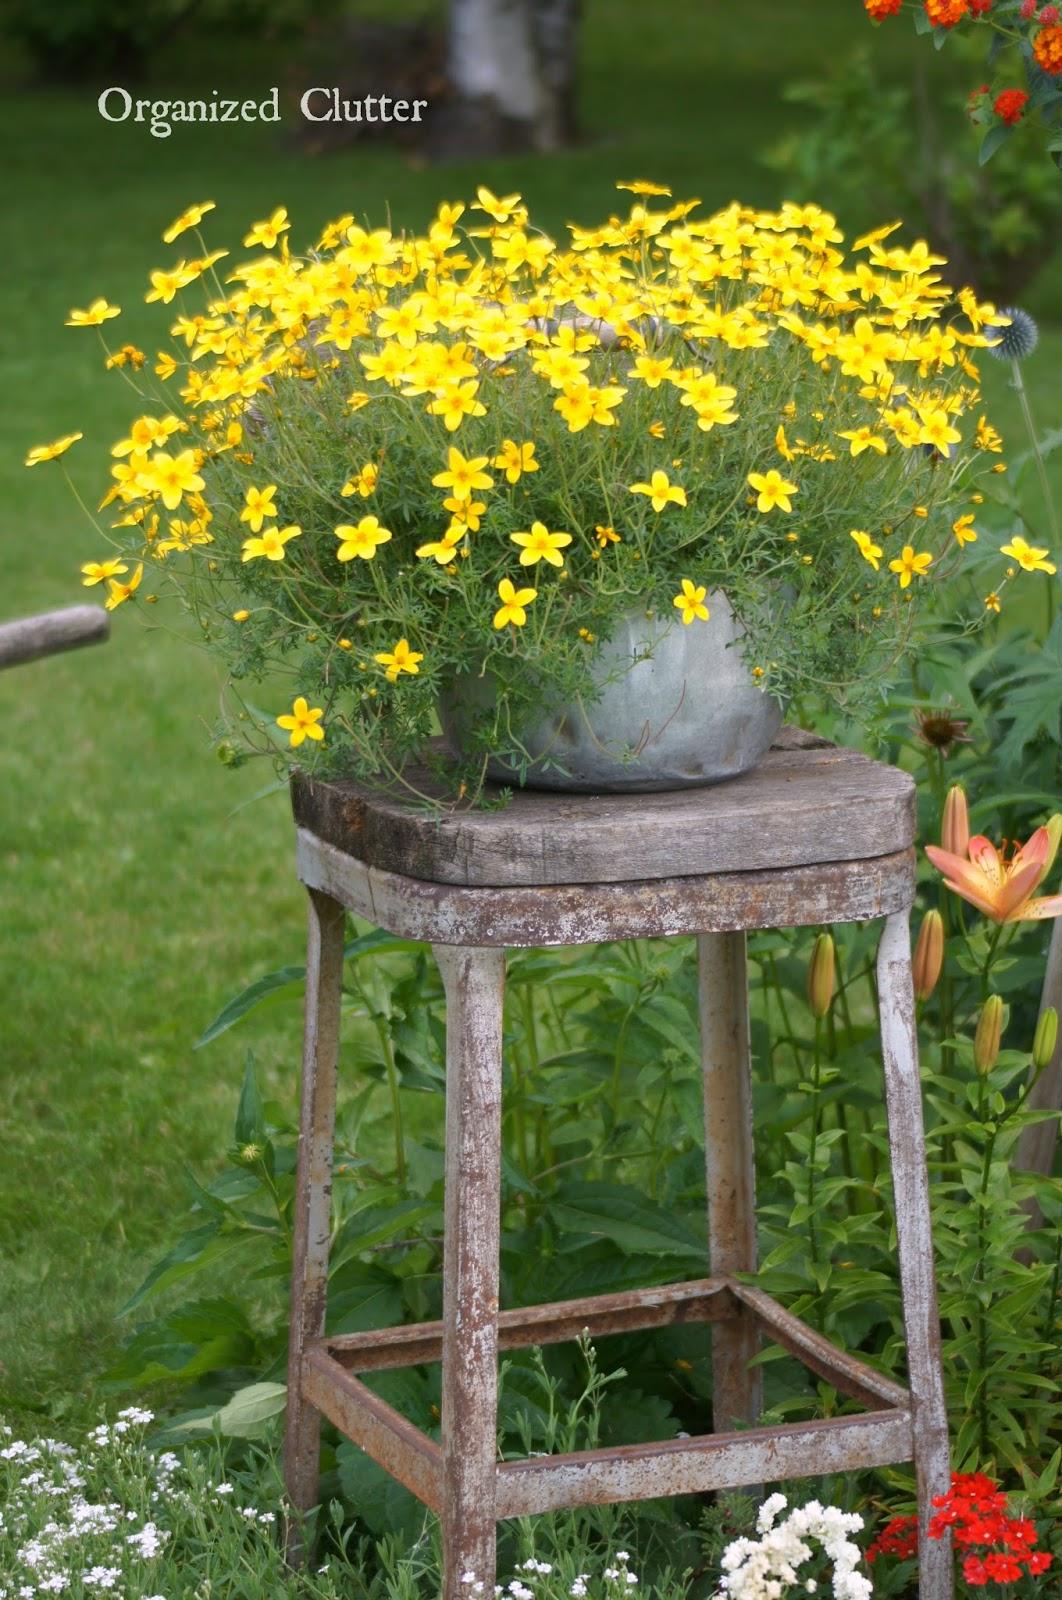 Bidens on a Rustic Stool www.organizedclutterqueen.blogspot.com